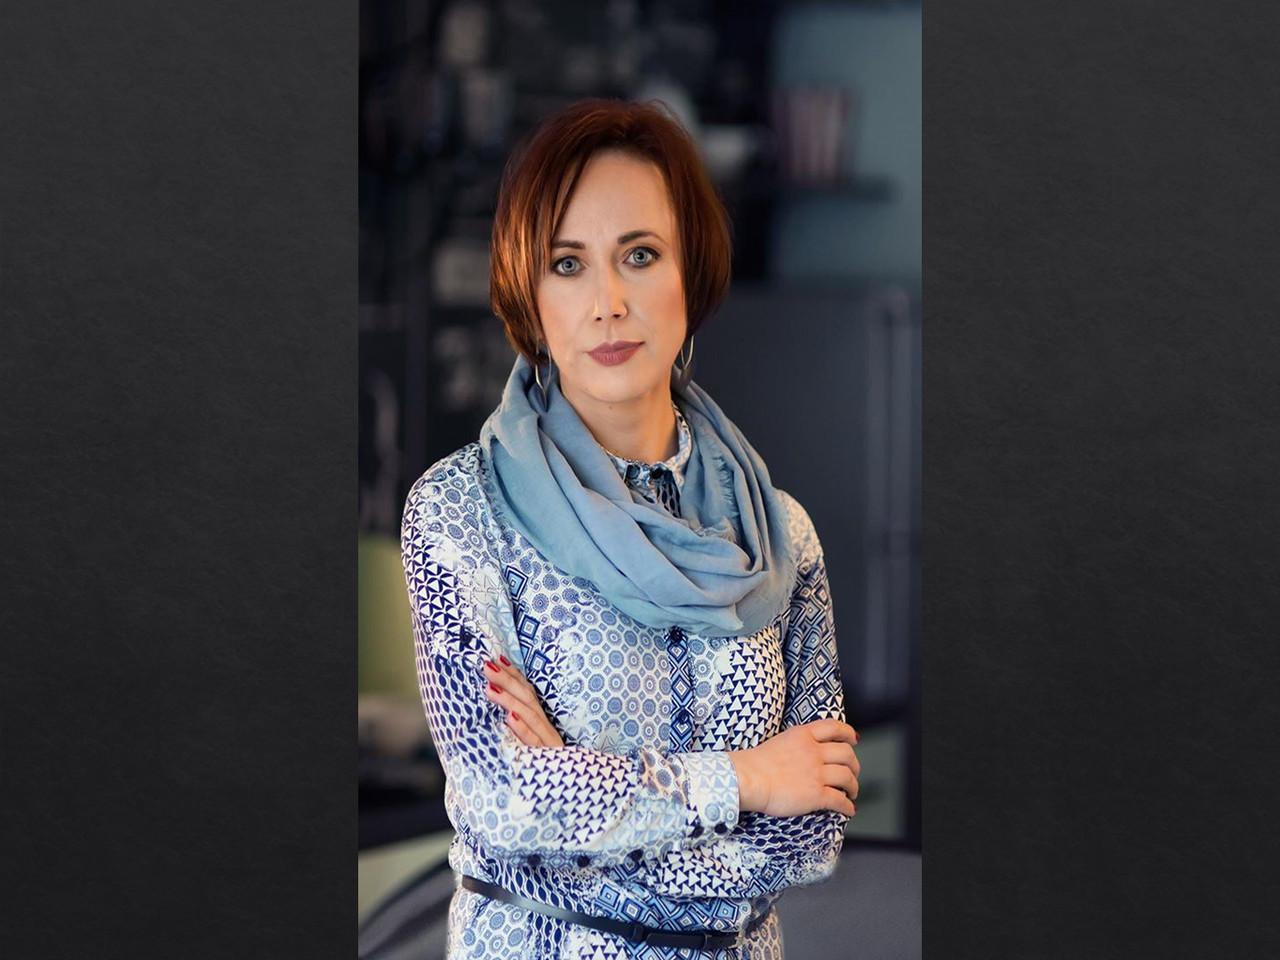 Alina Stasiak 2